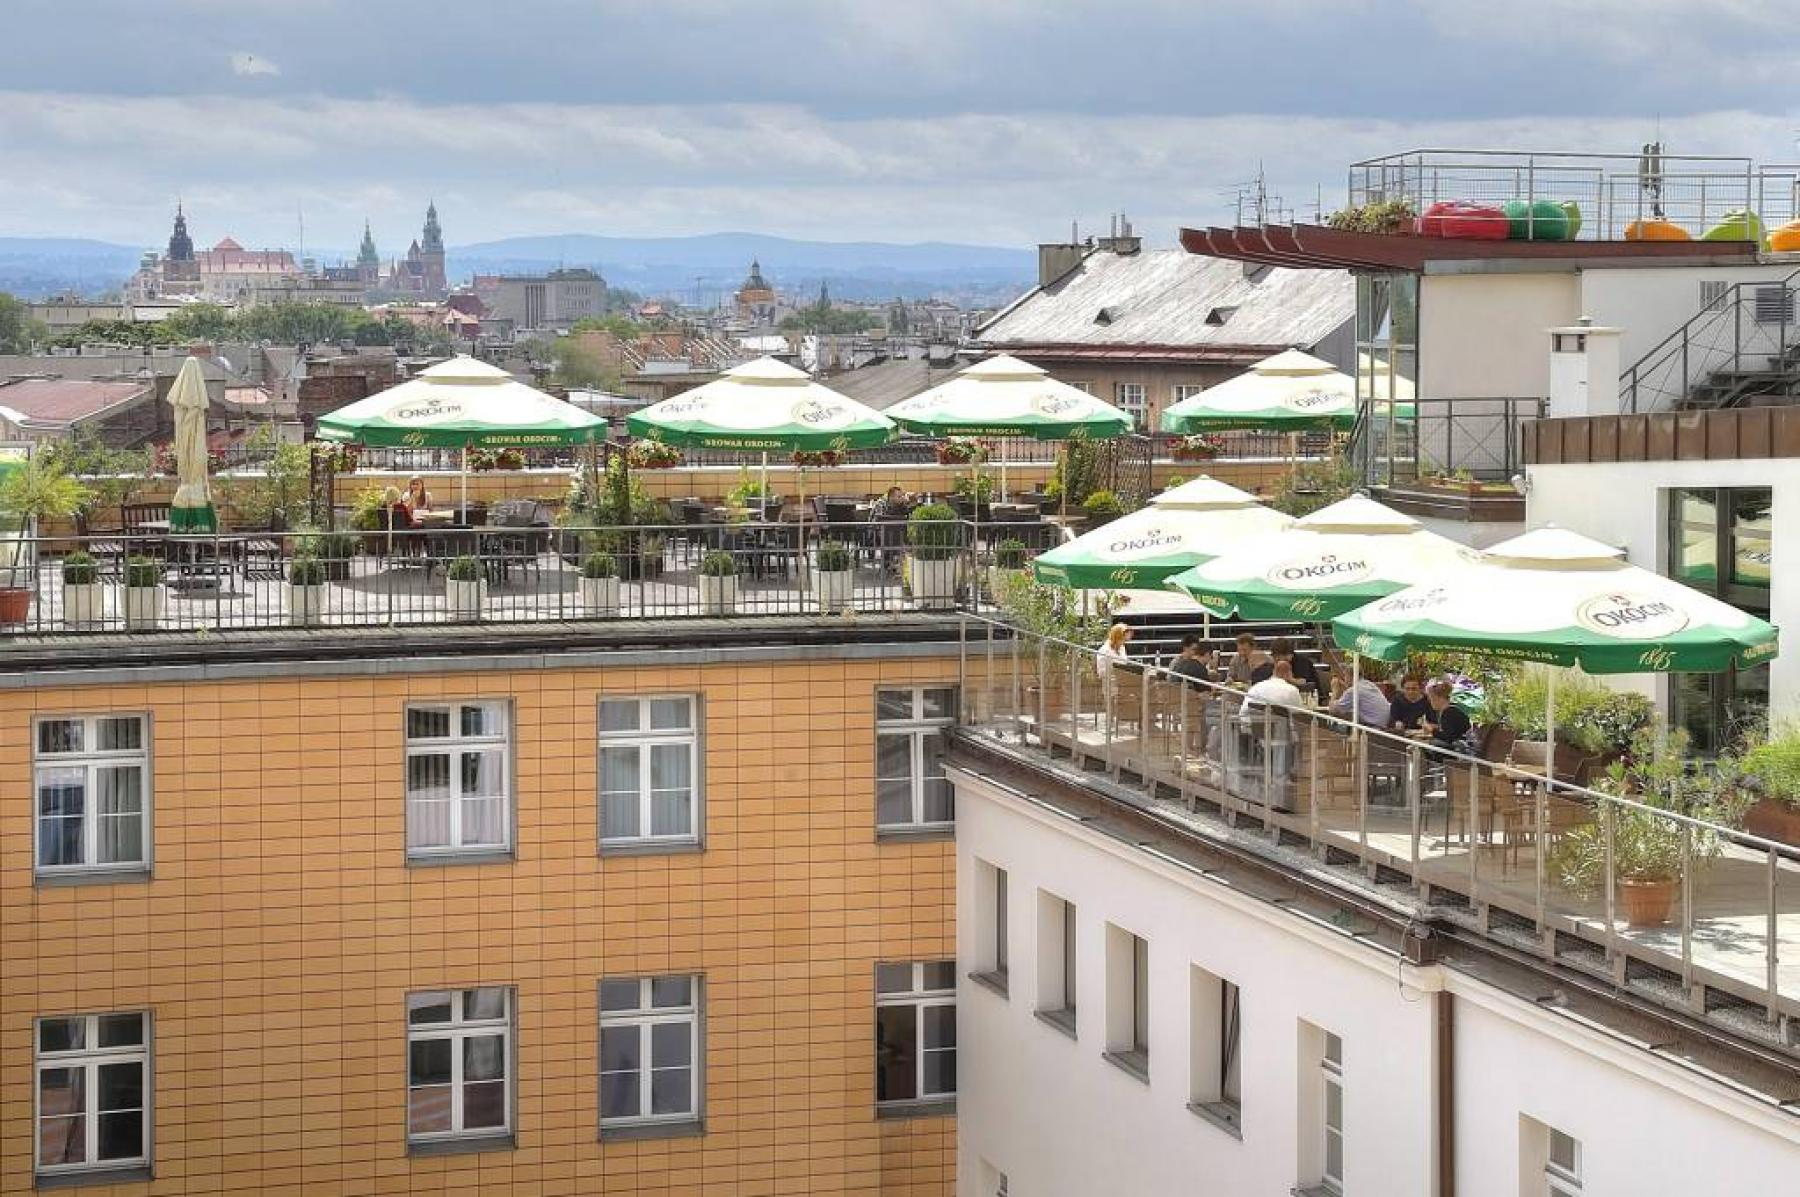 terrace aleja slowackiego 64 cracow